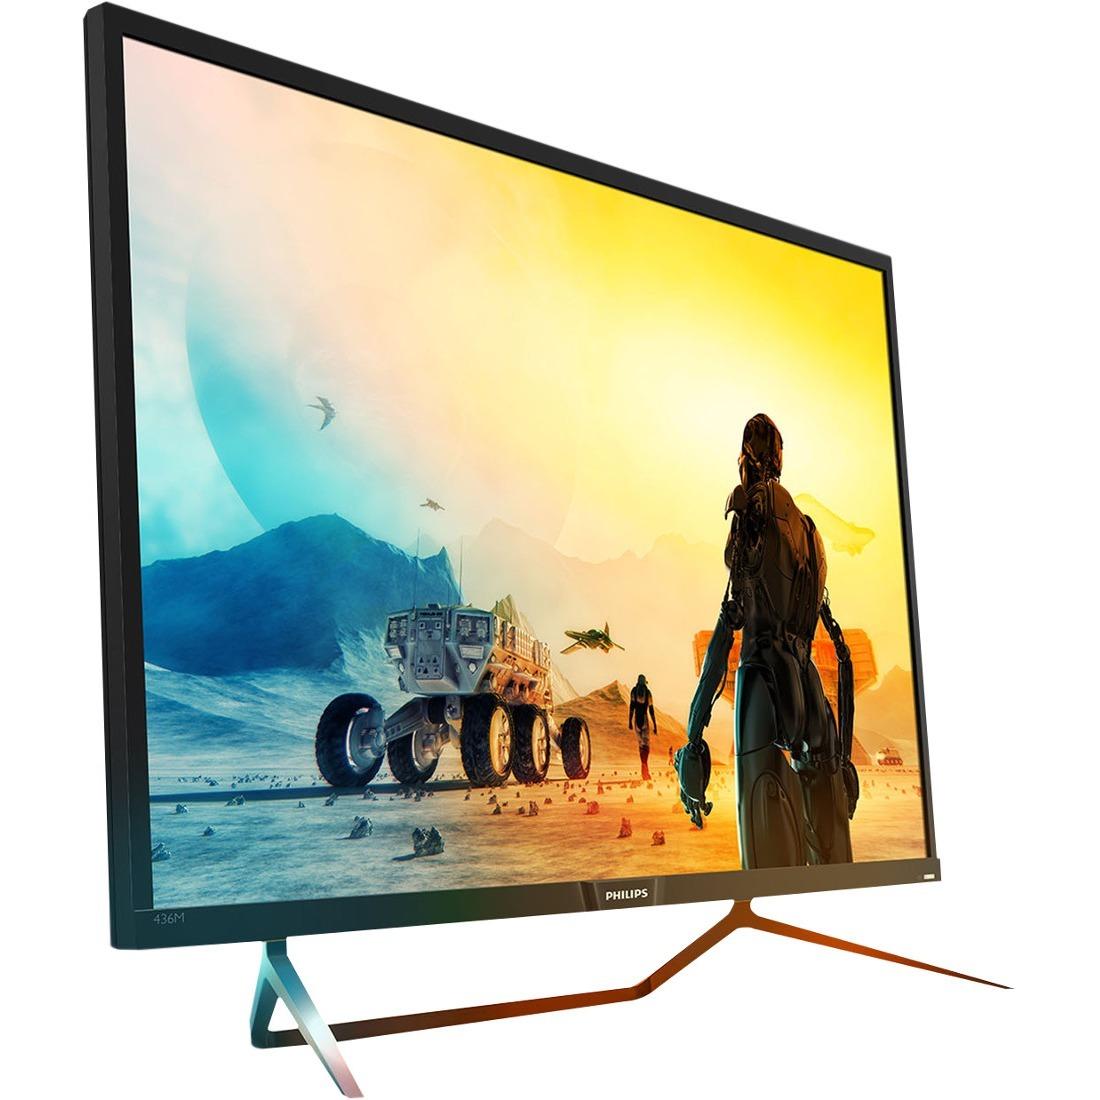 "Philips Momentum 436M6VBPAB 42.5"" 4K UHD WLED Gaming LCD Monitor - 16:9 - Textured Black, Glossy Black_subImage_1"